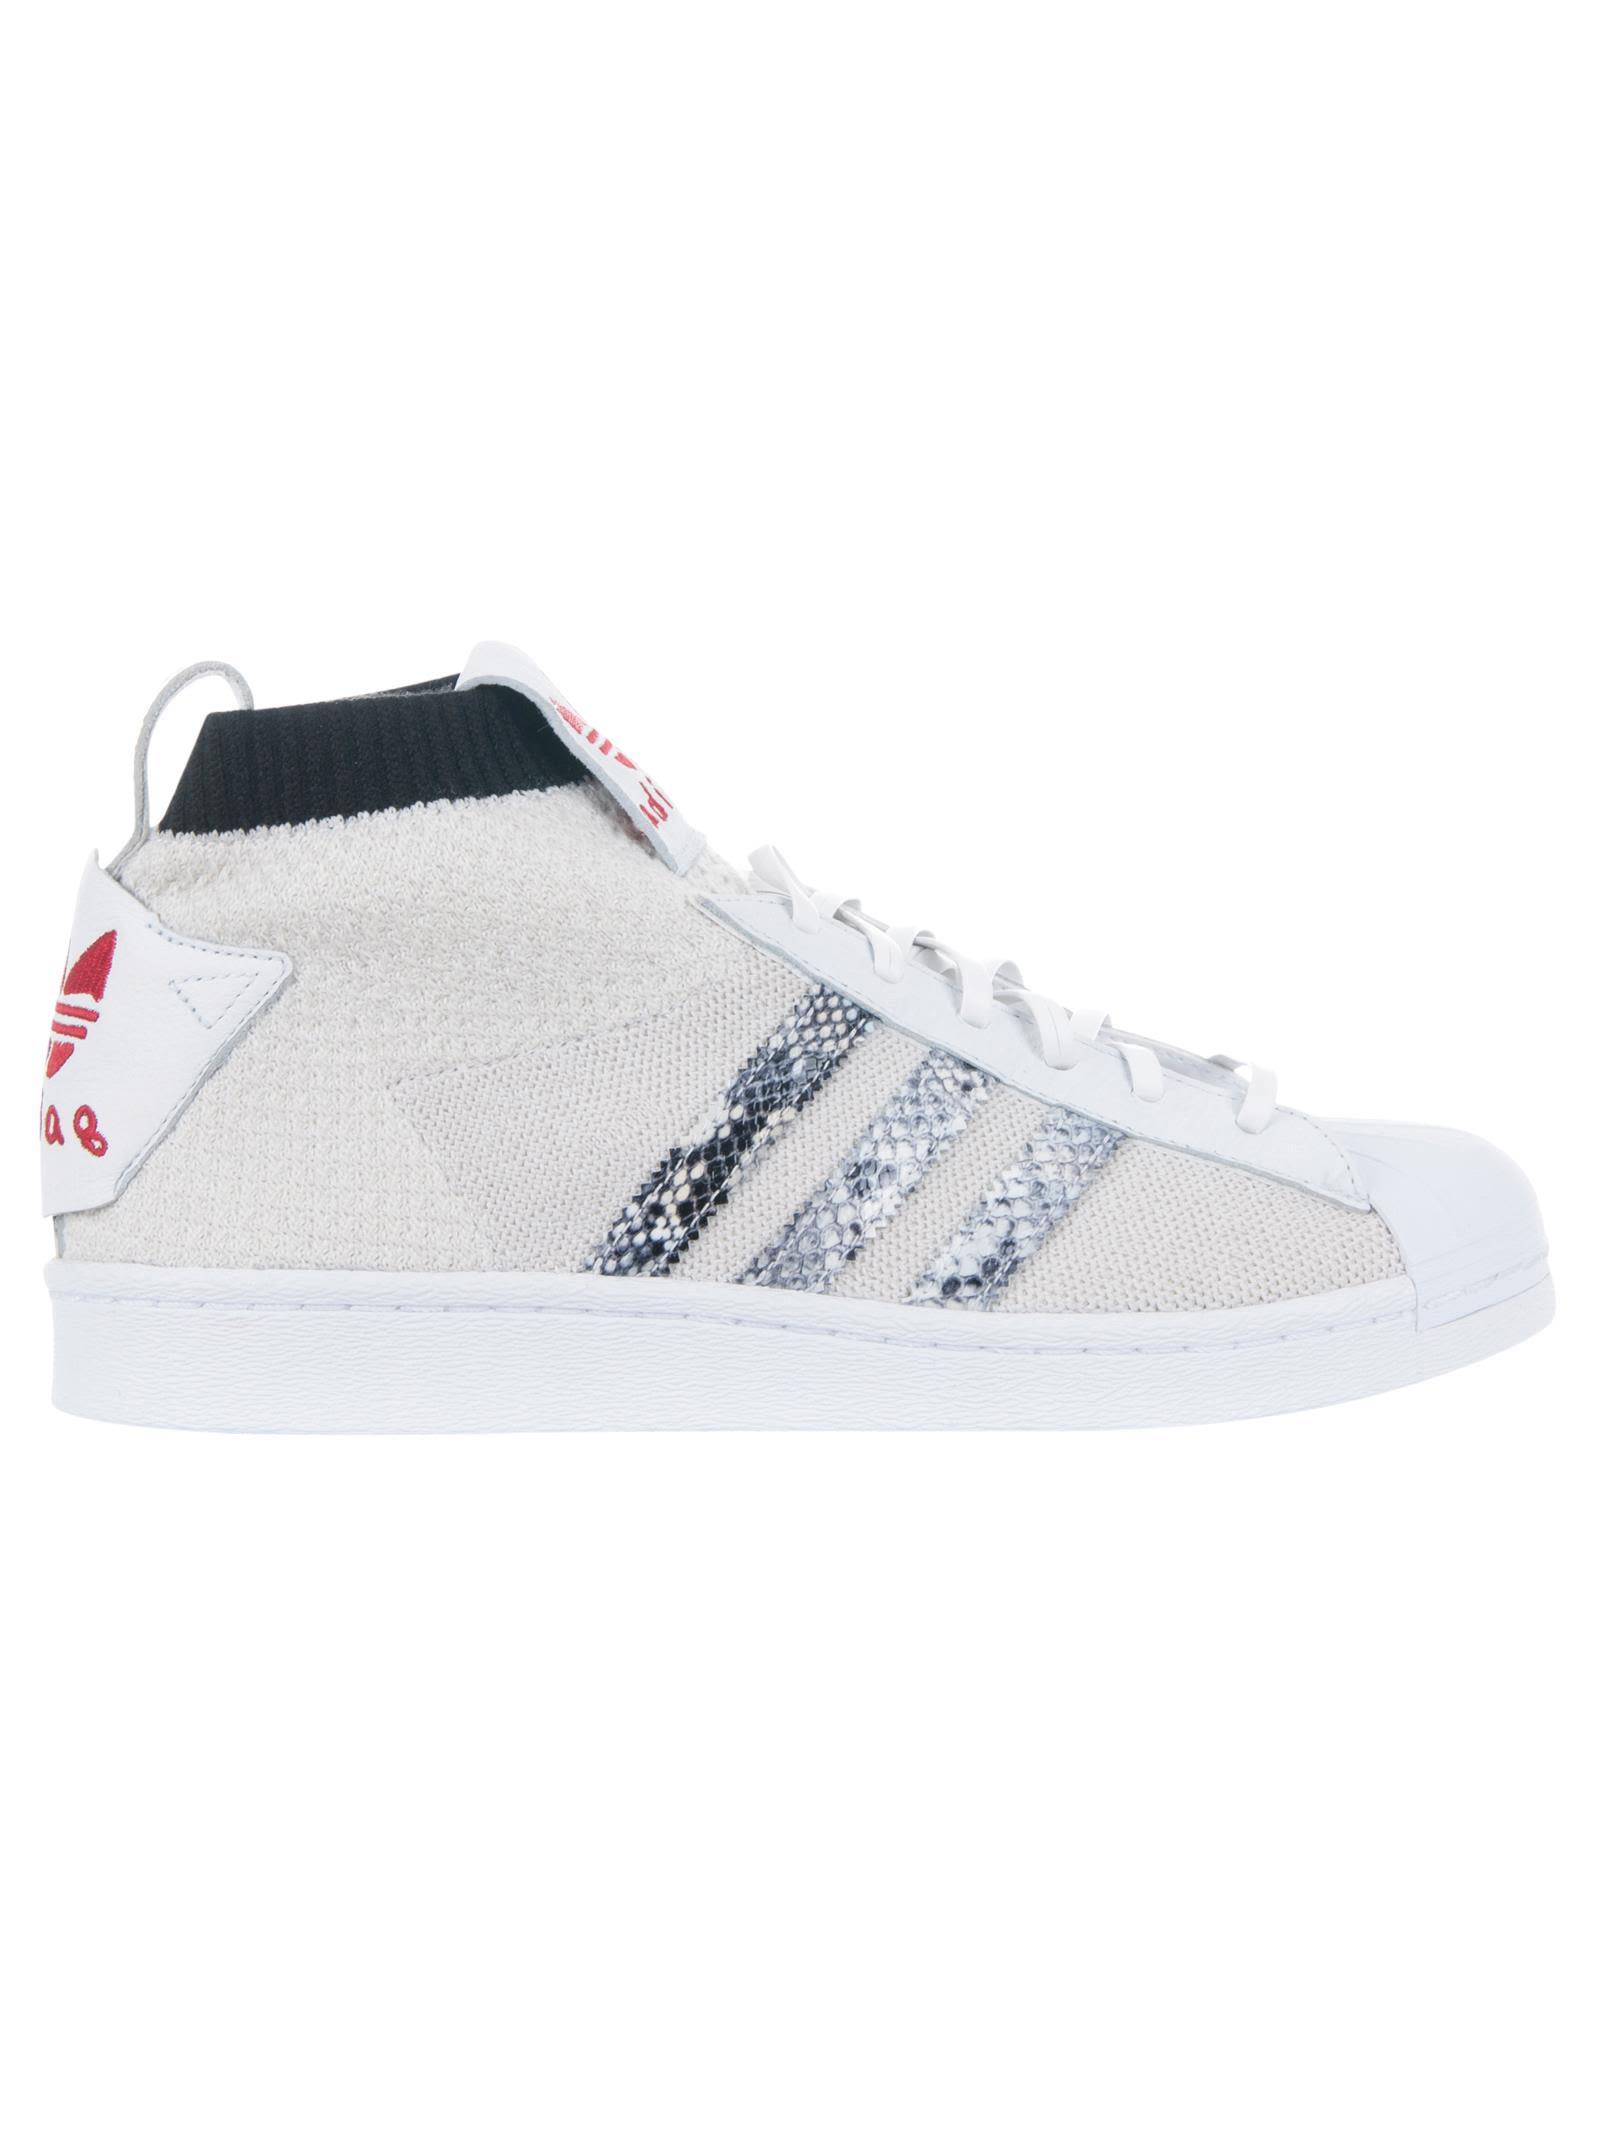 ADIDAS ORIGINALS BY UNITED ARROWS & SONS Adidas X United Arrows & Sons Ultra Star in Bianco